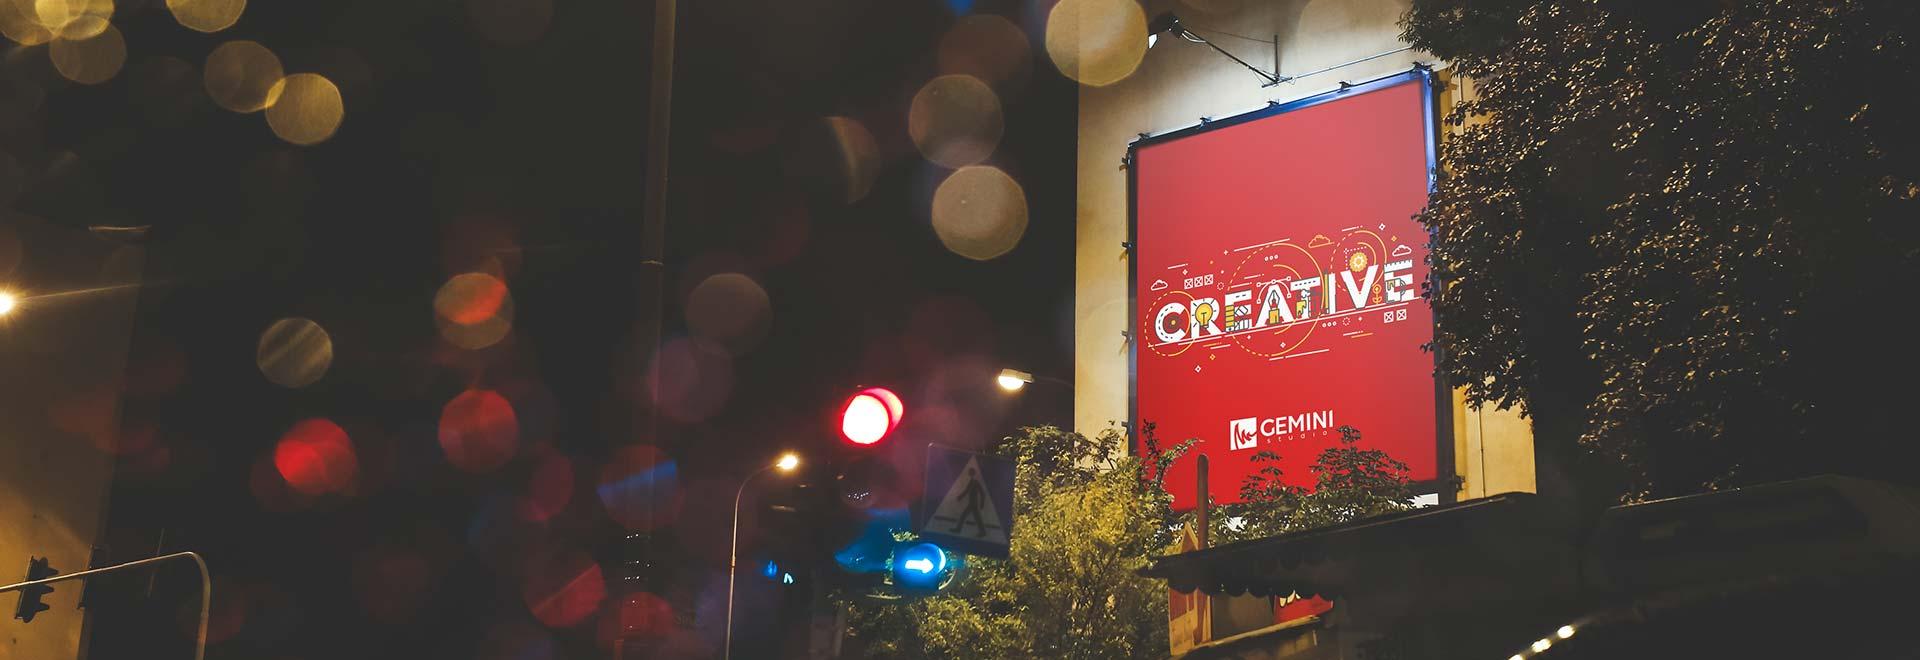 Billboard Creative Gemini Studio